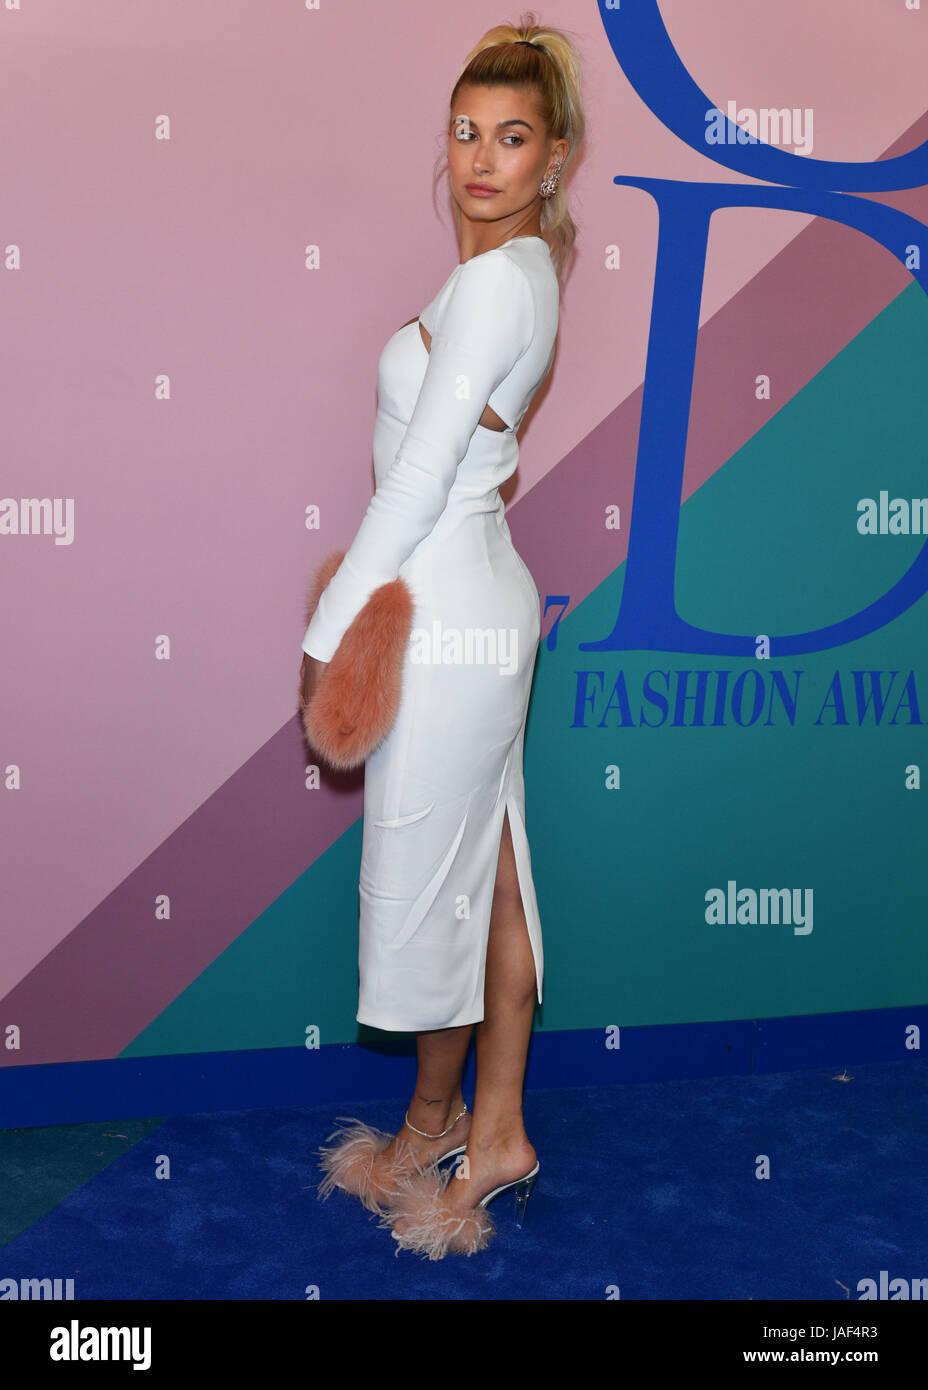 New York, USA. 5th Jun, 2017. Hailey Baldwin attends the 2017 CFDA Fashion Awards at Hammerstein Ballroom on June - Stock Image